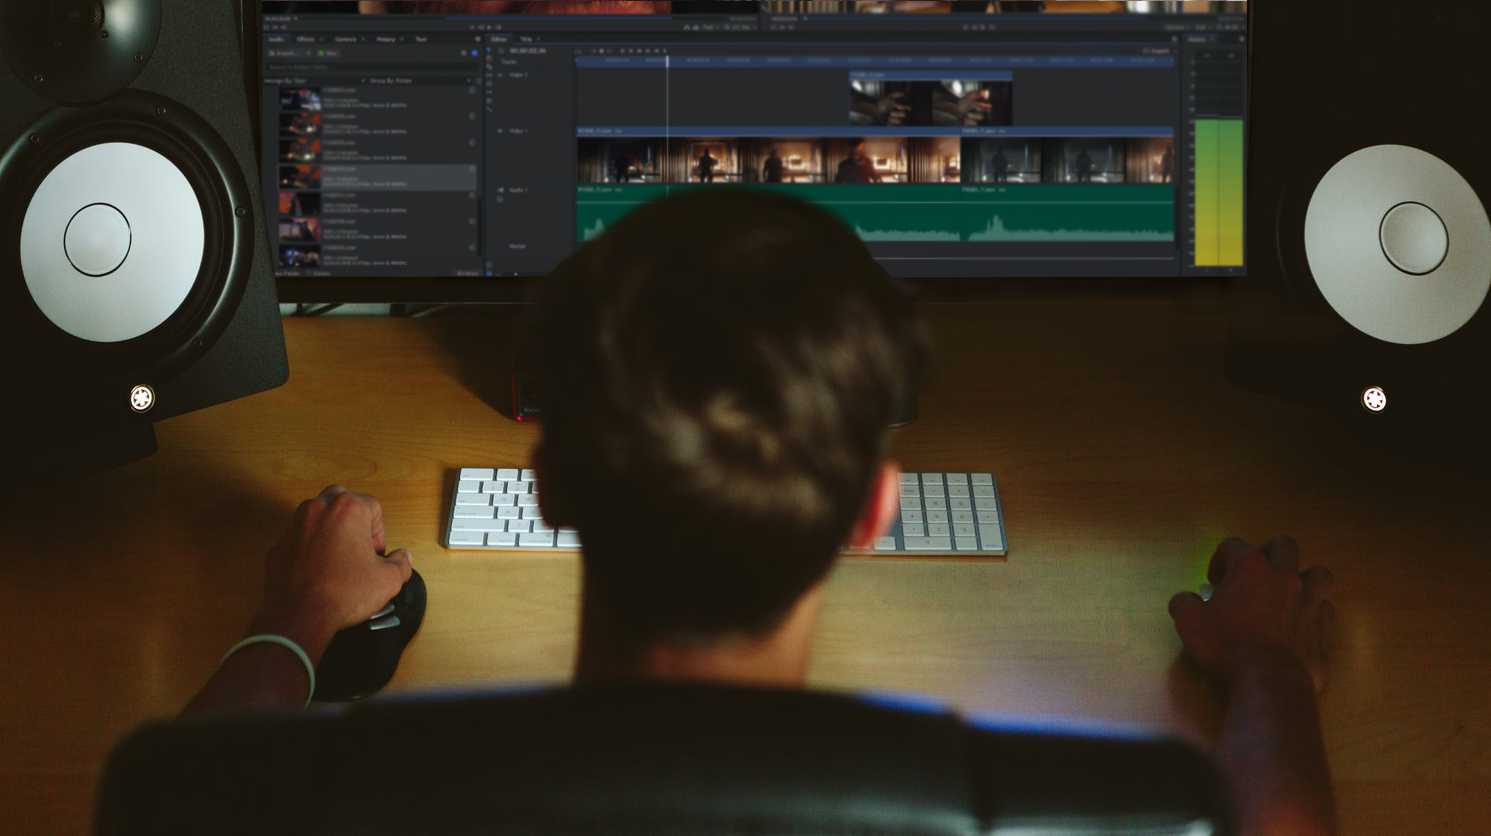 VFX artist working at a desk on HitFilm Pro VFX software - what does a VFX artist do?